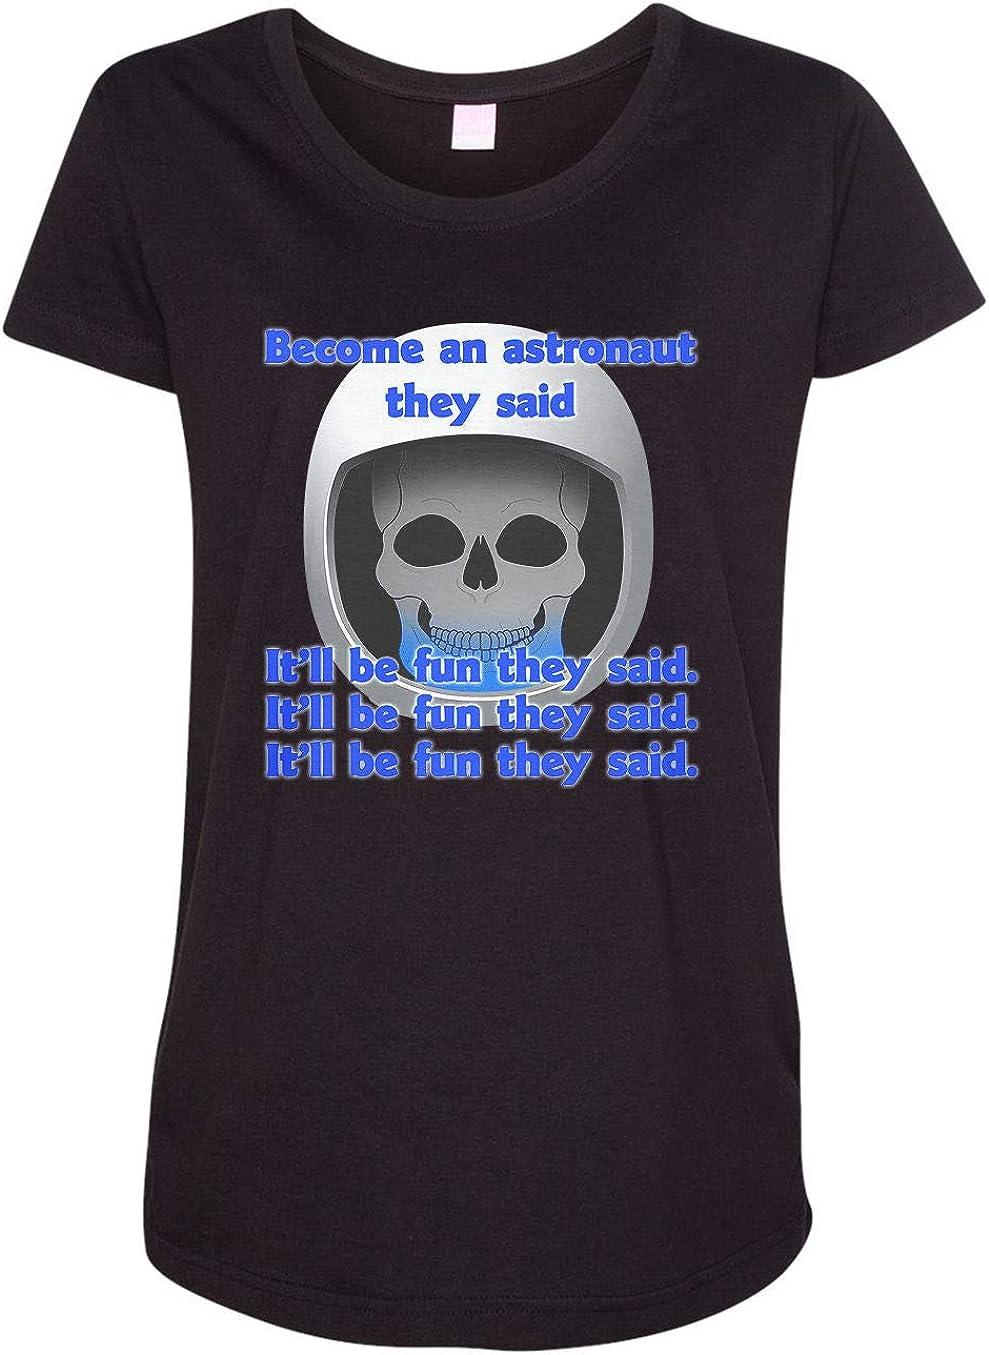 HARD EDGE DESIGN Women's It'll Be Fun They Said T-Shirt